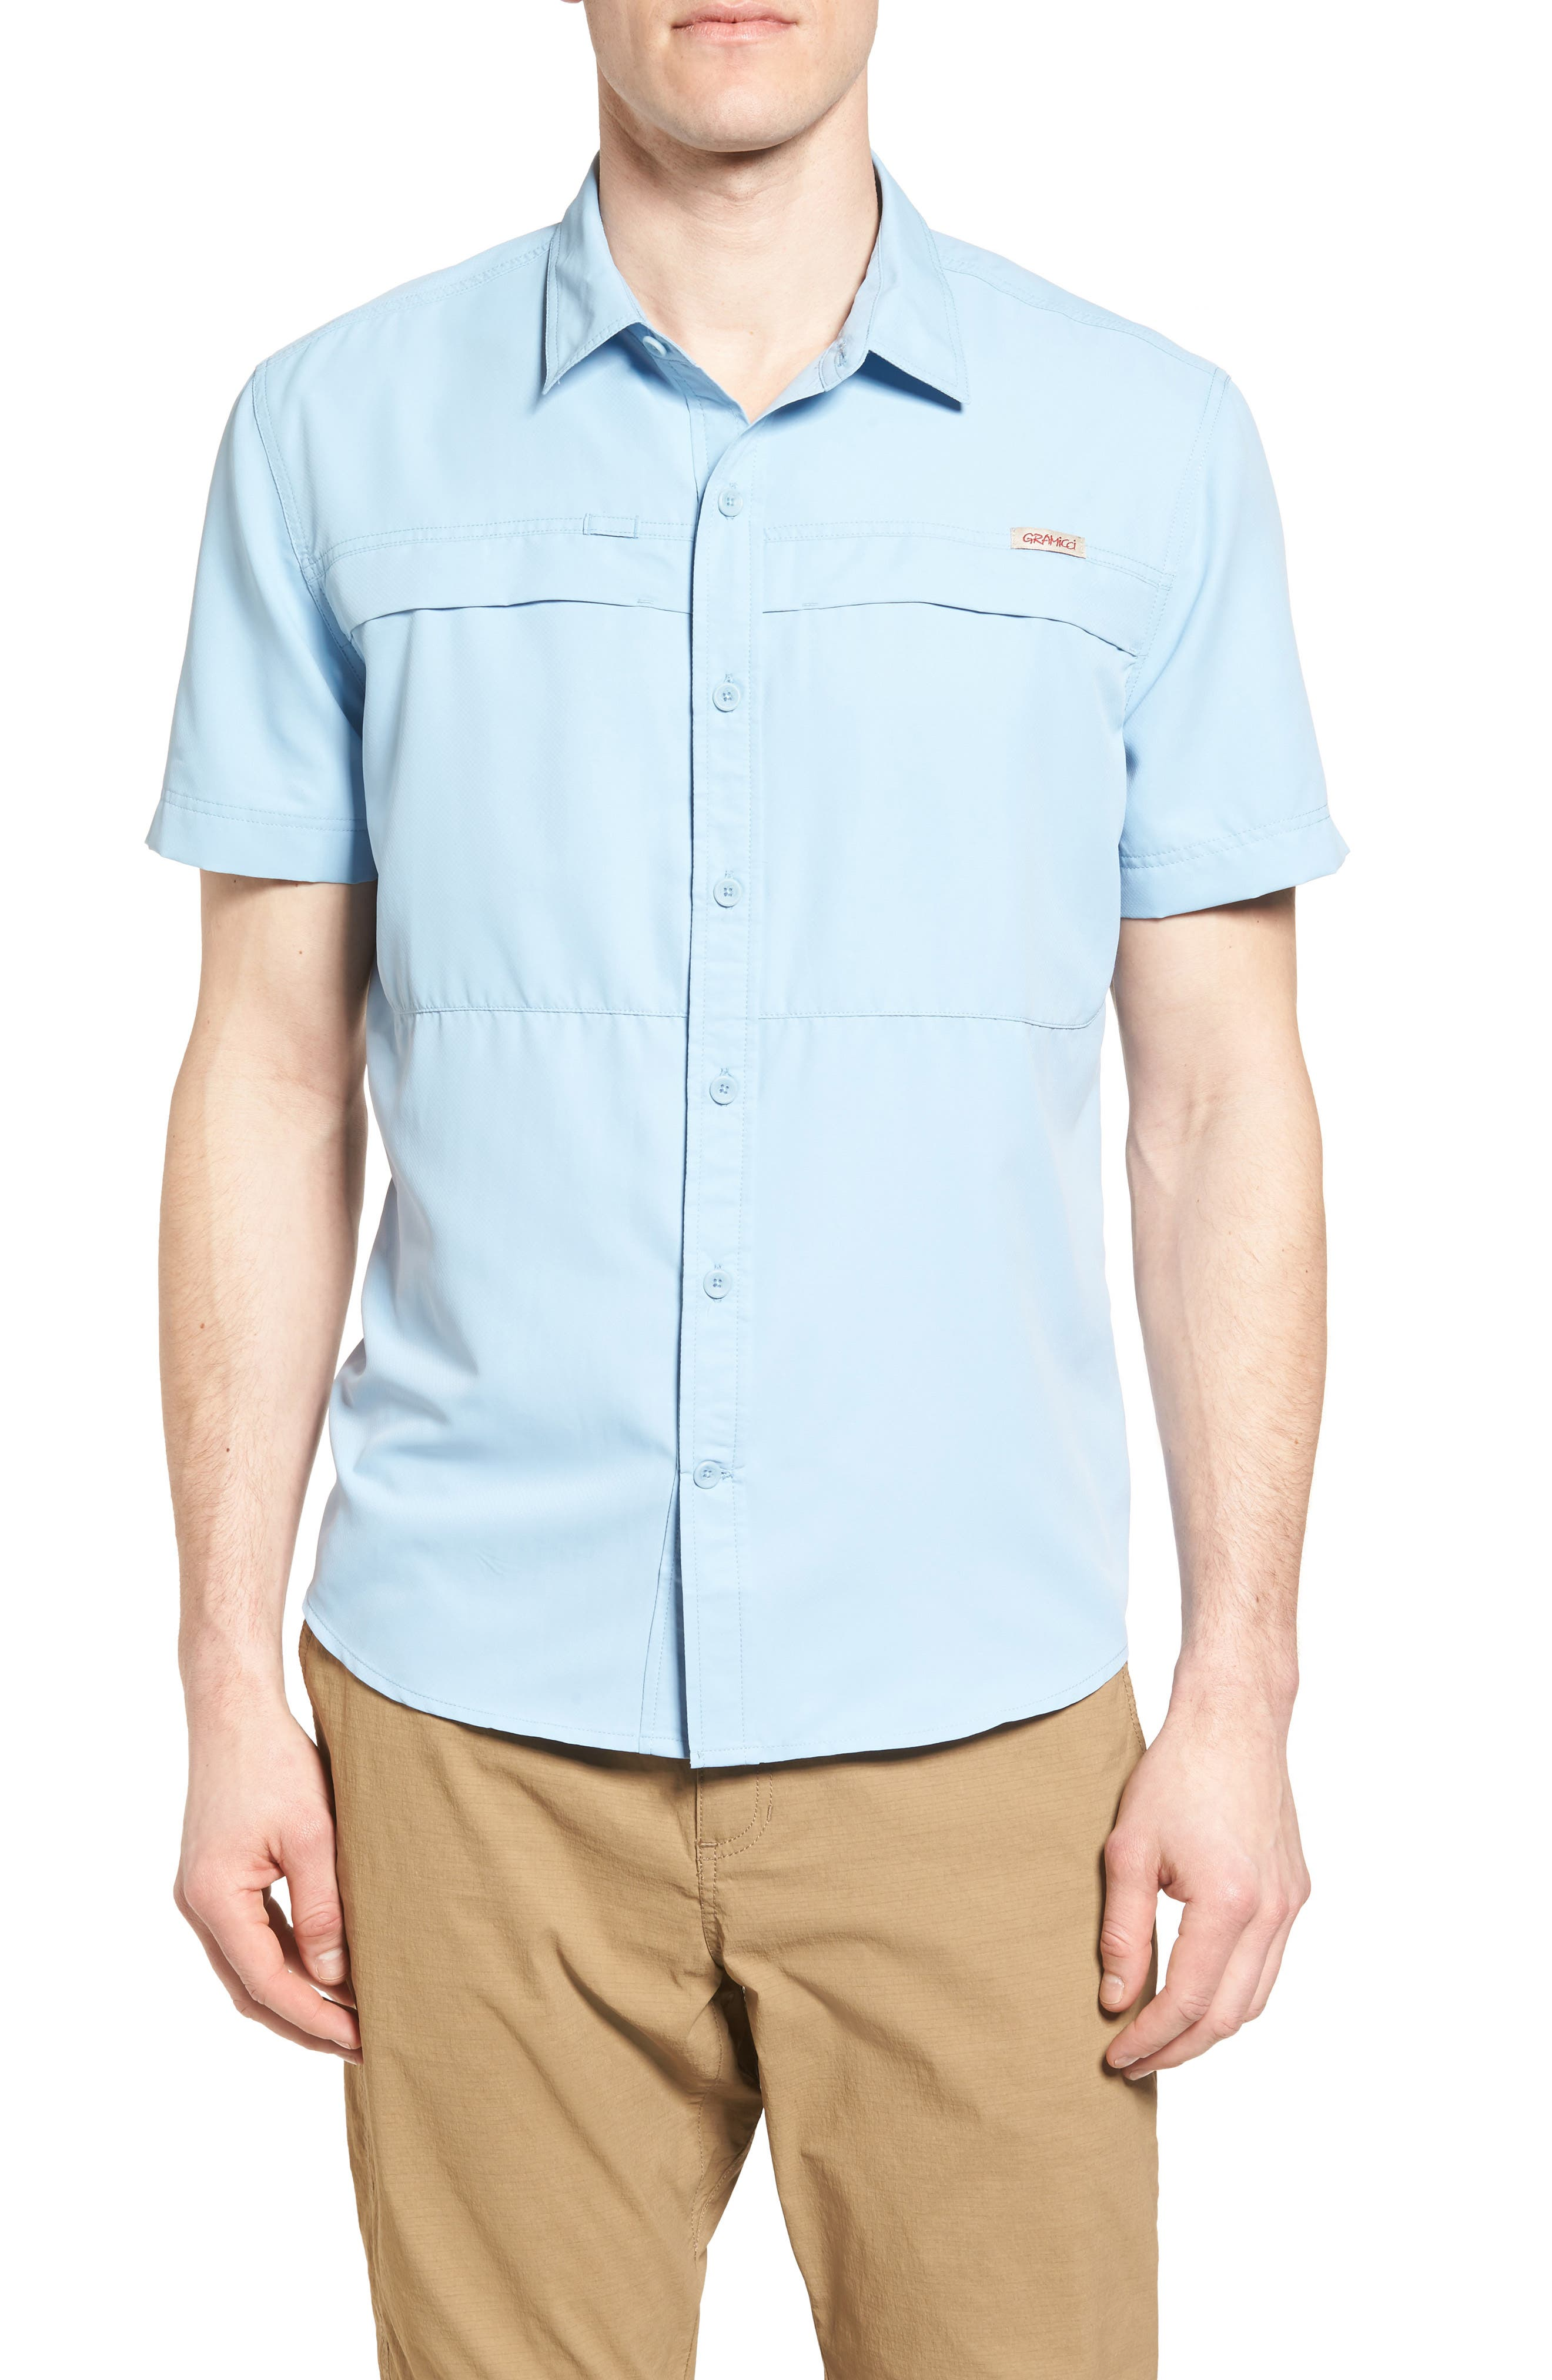 Main Image - Gramicci Pescador Tech Shirt